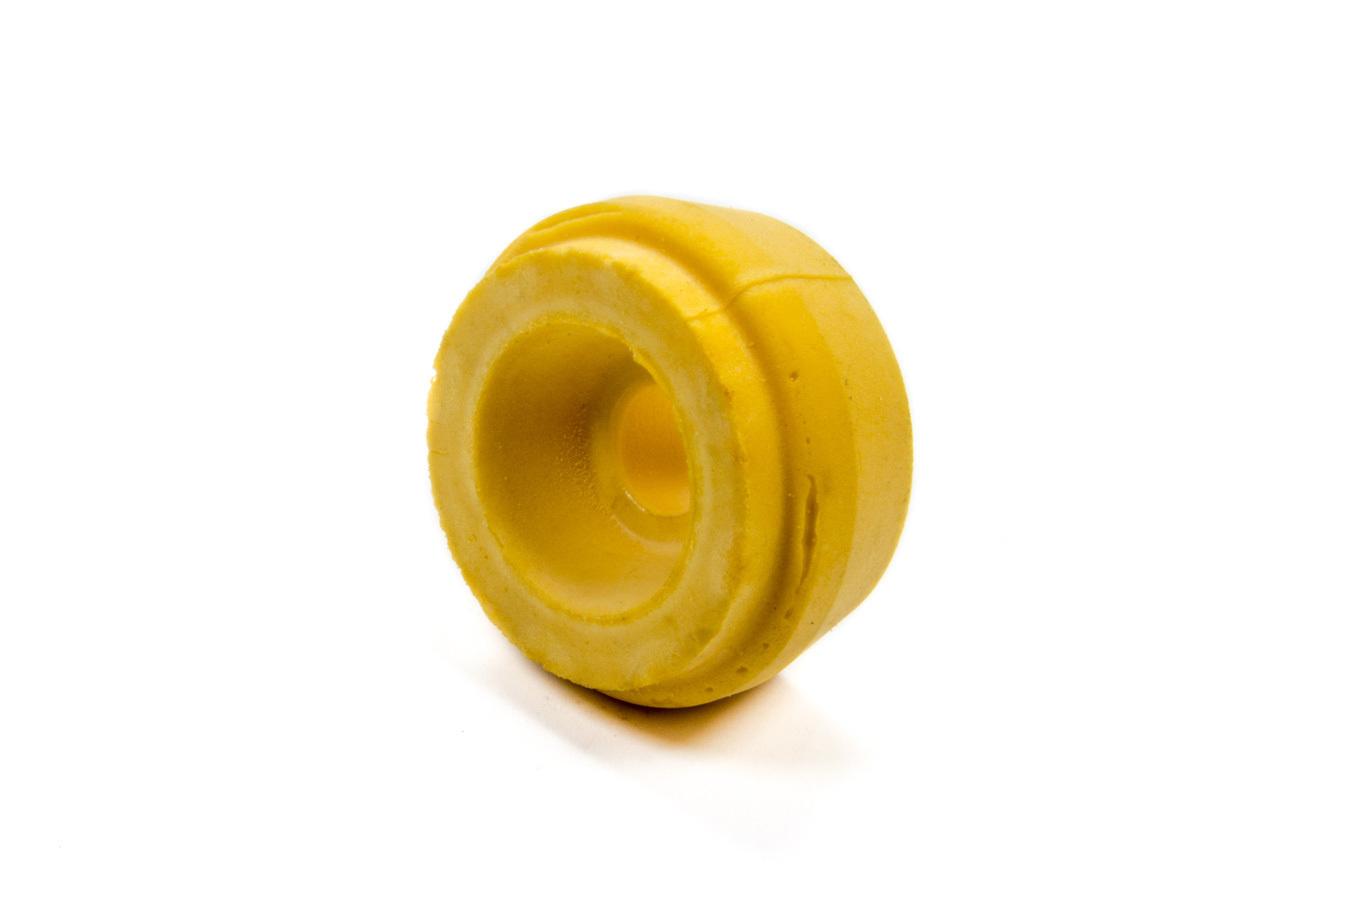 Koni Shocks 72-34-48-000-0 Bump Stop, 1.000 in Tall, 16 mm ID, Soft, Polyurethane, Tan, Each